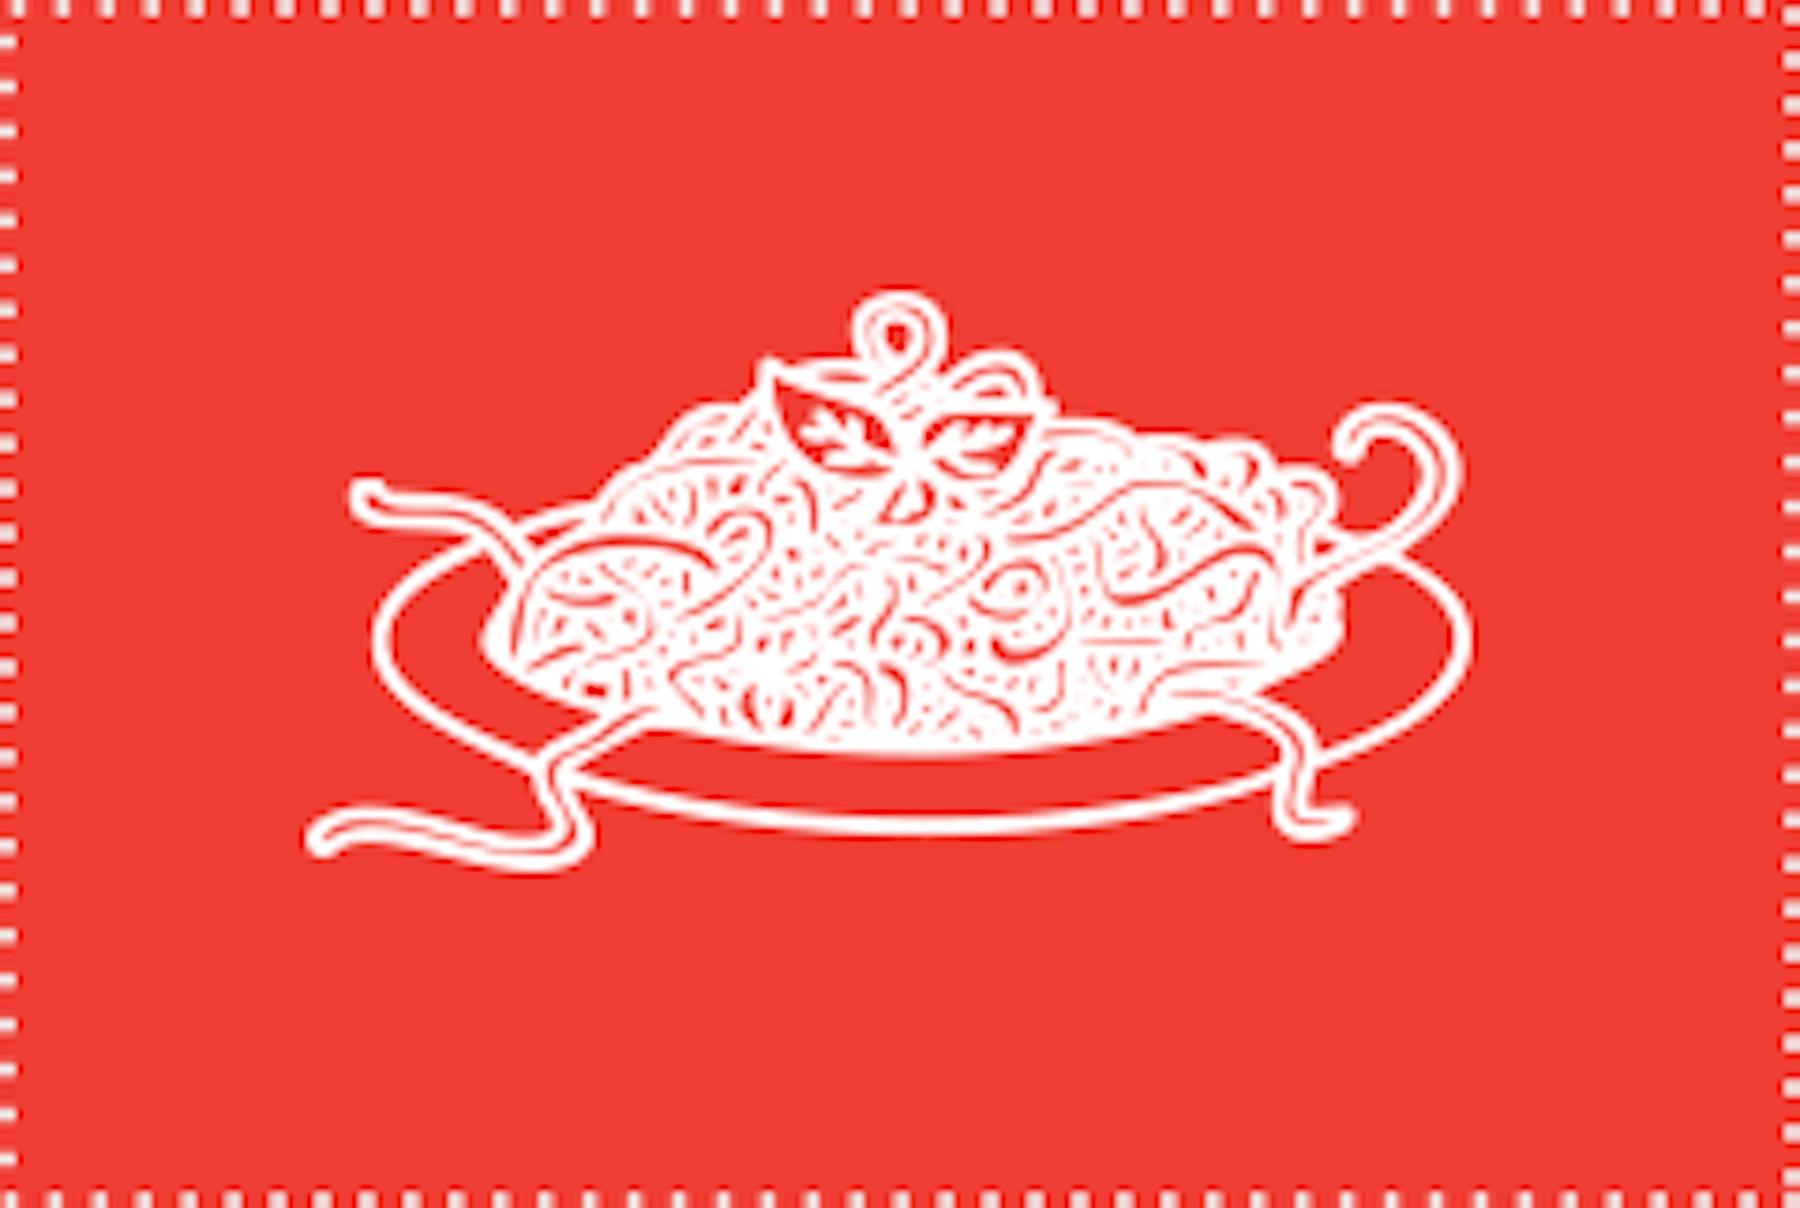 Lunch/Dinner Rollover